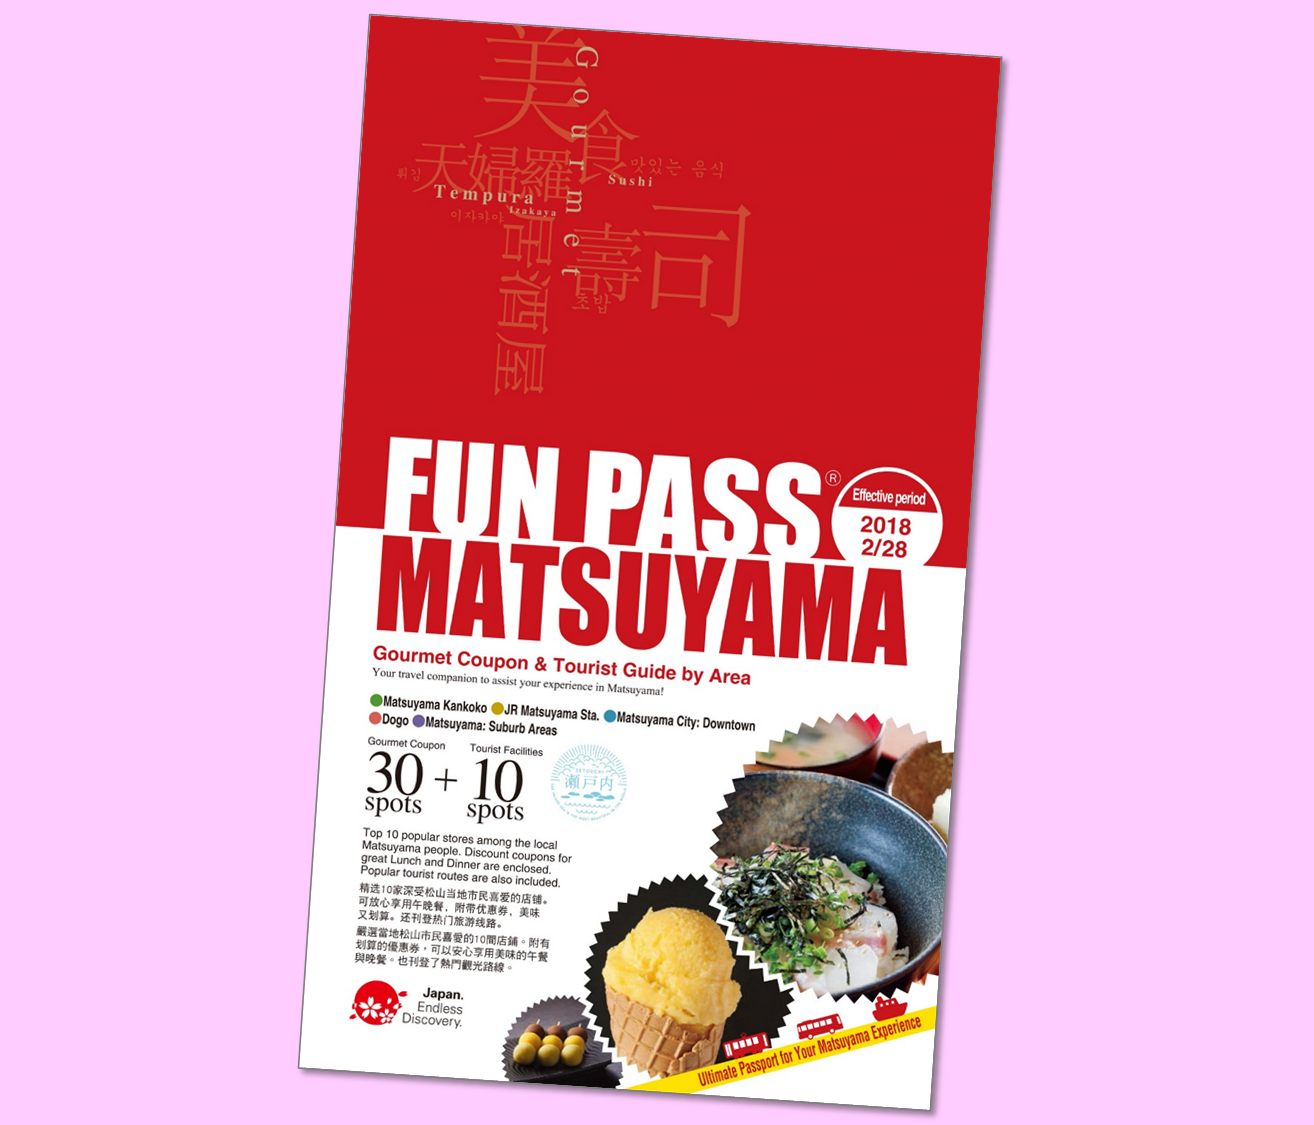 FUN PASS® MATSUYAMA(附有各種優惠券及當地的觀光導覽情報)